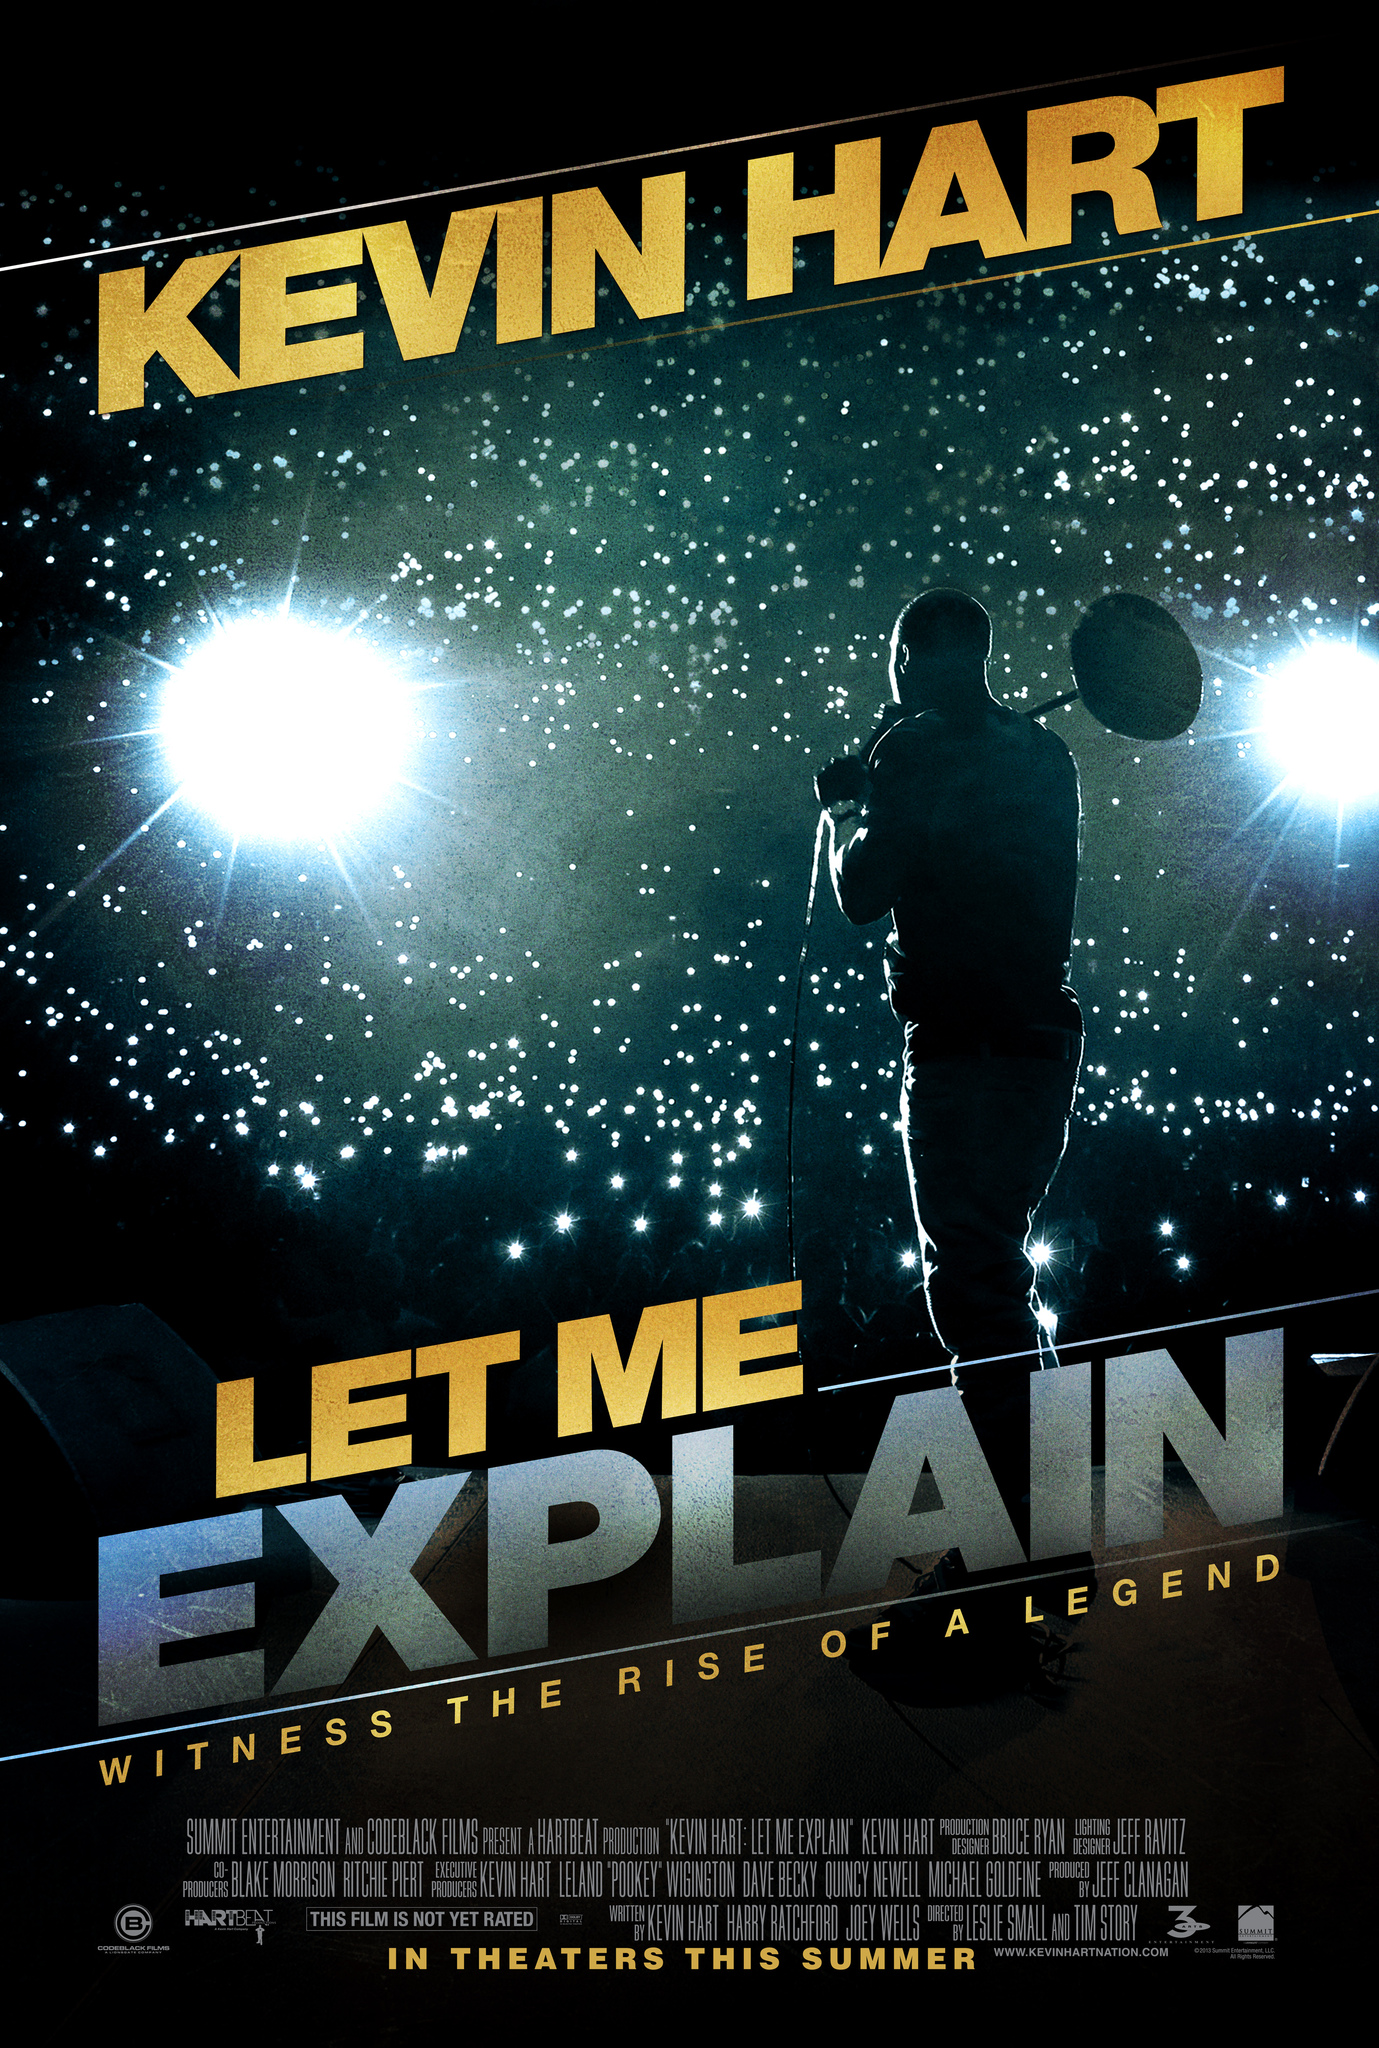 kevin hart let me explain free movie download